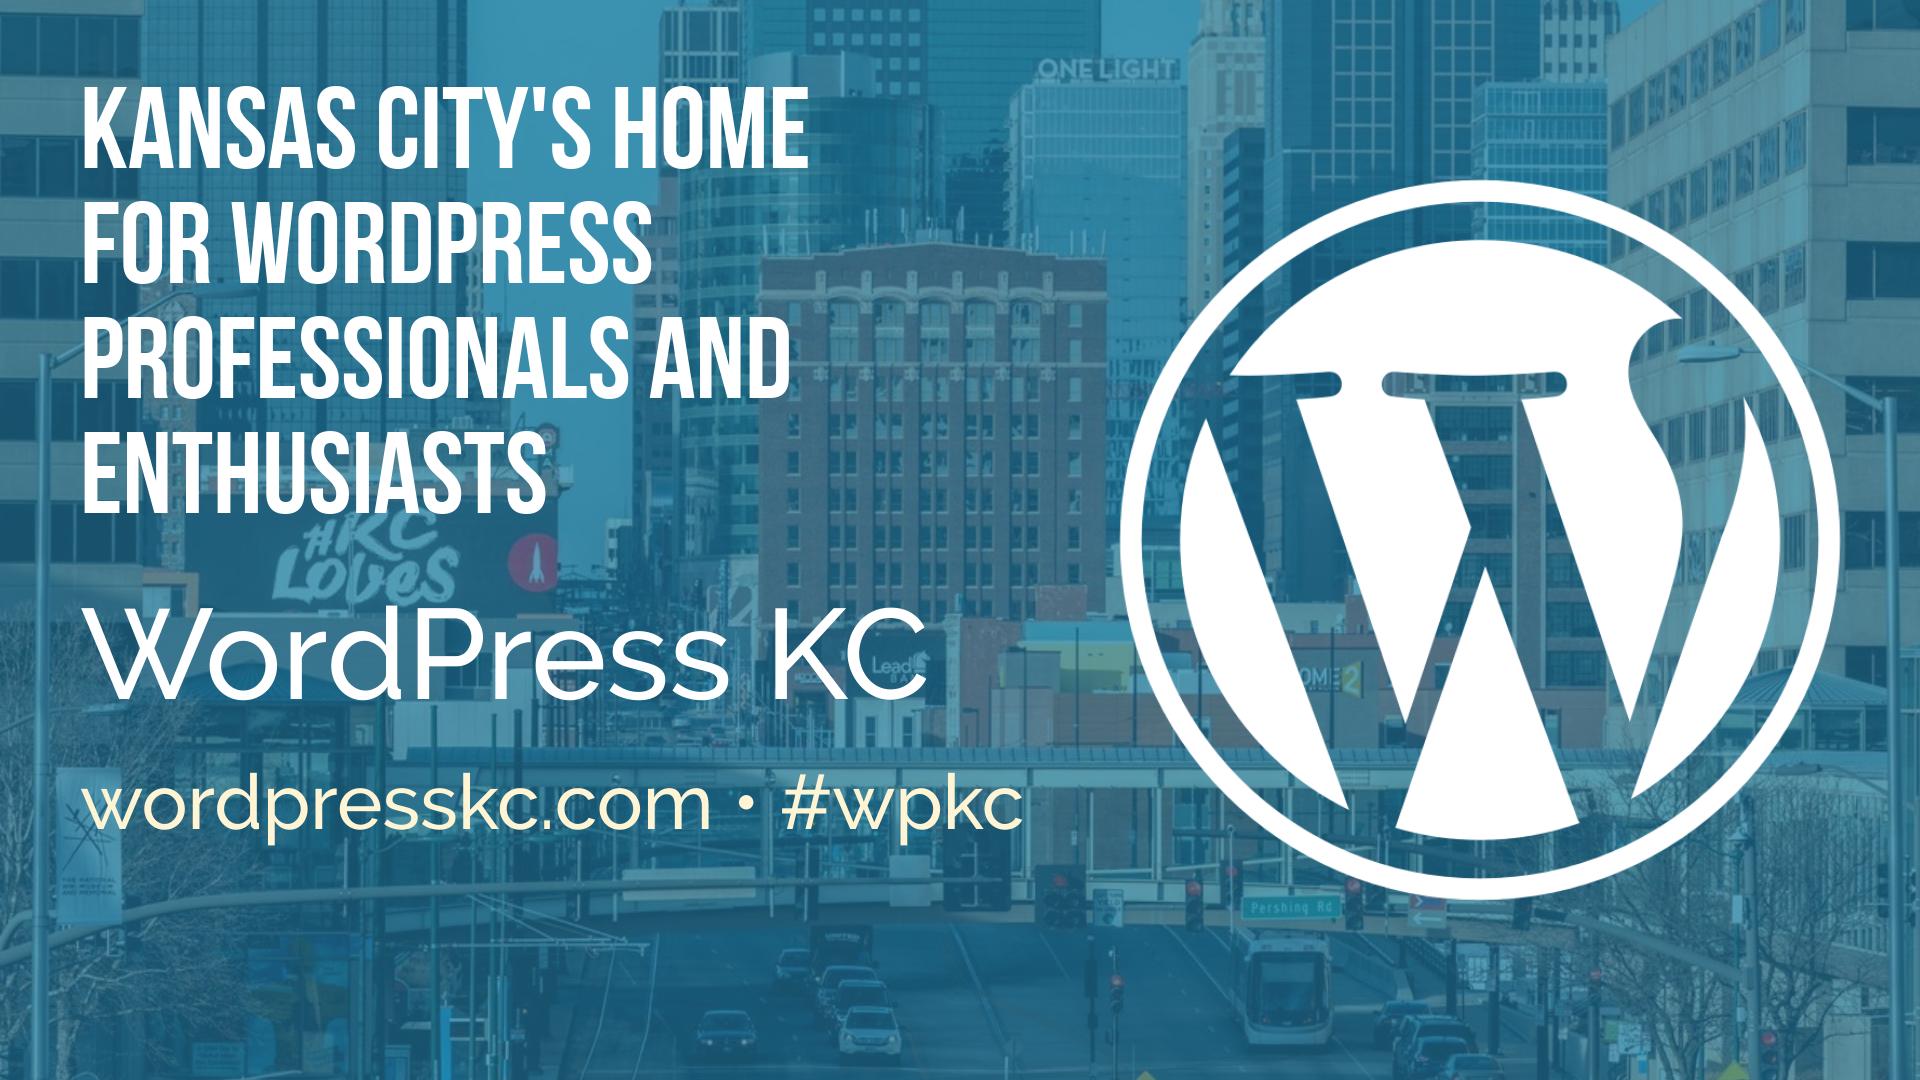 WordPressKC